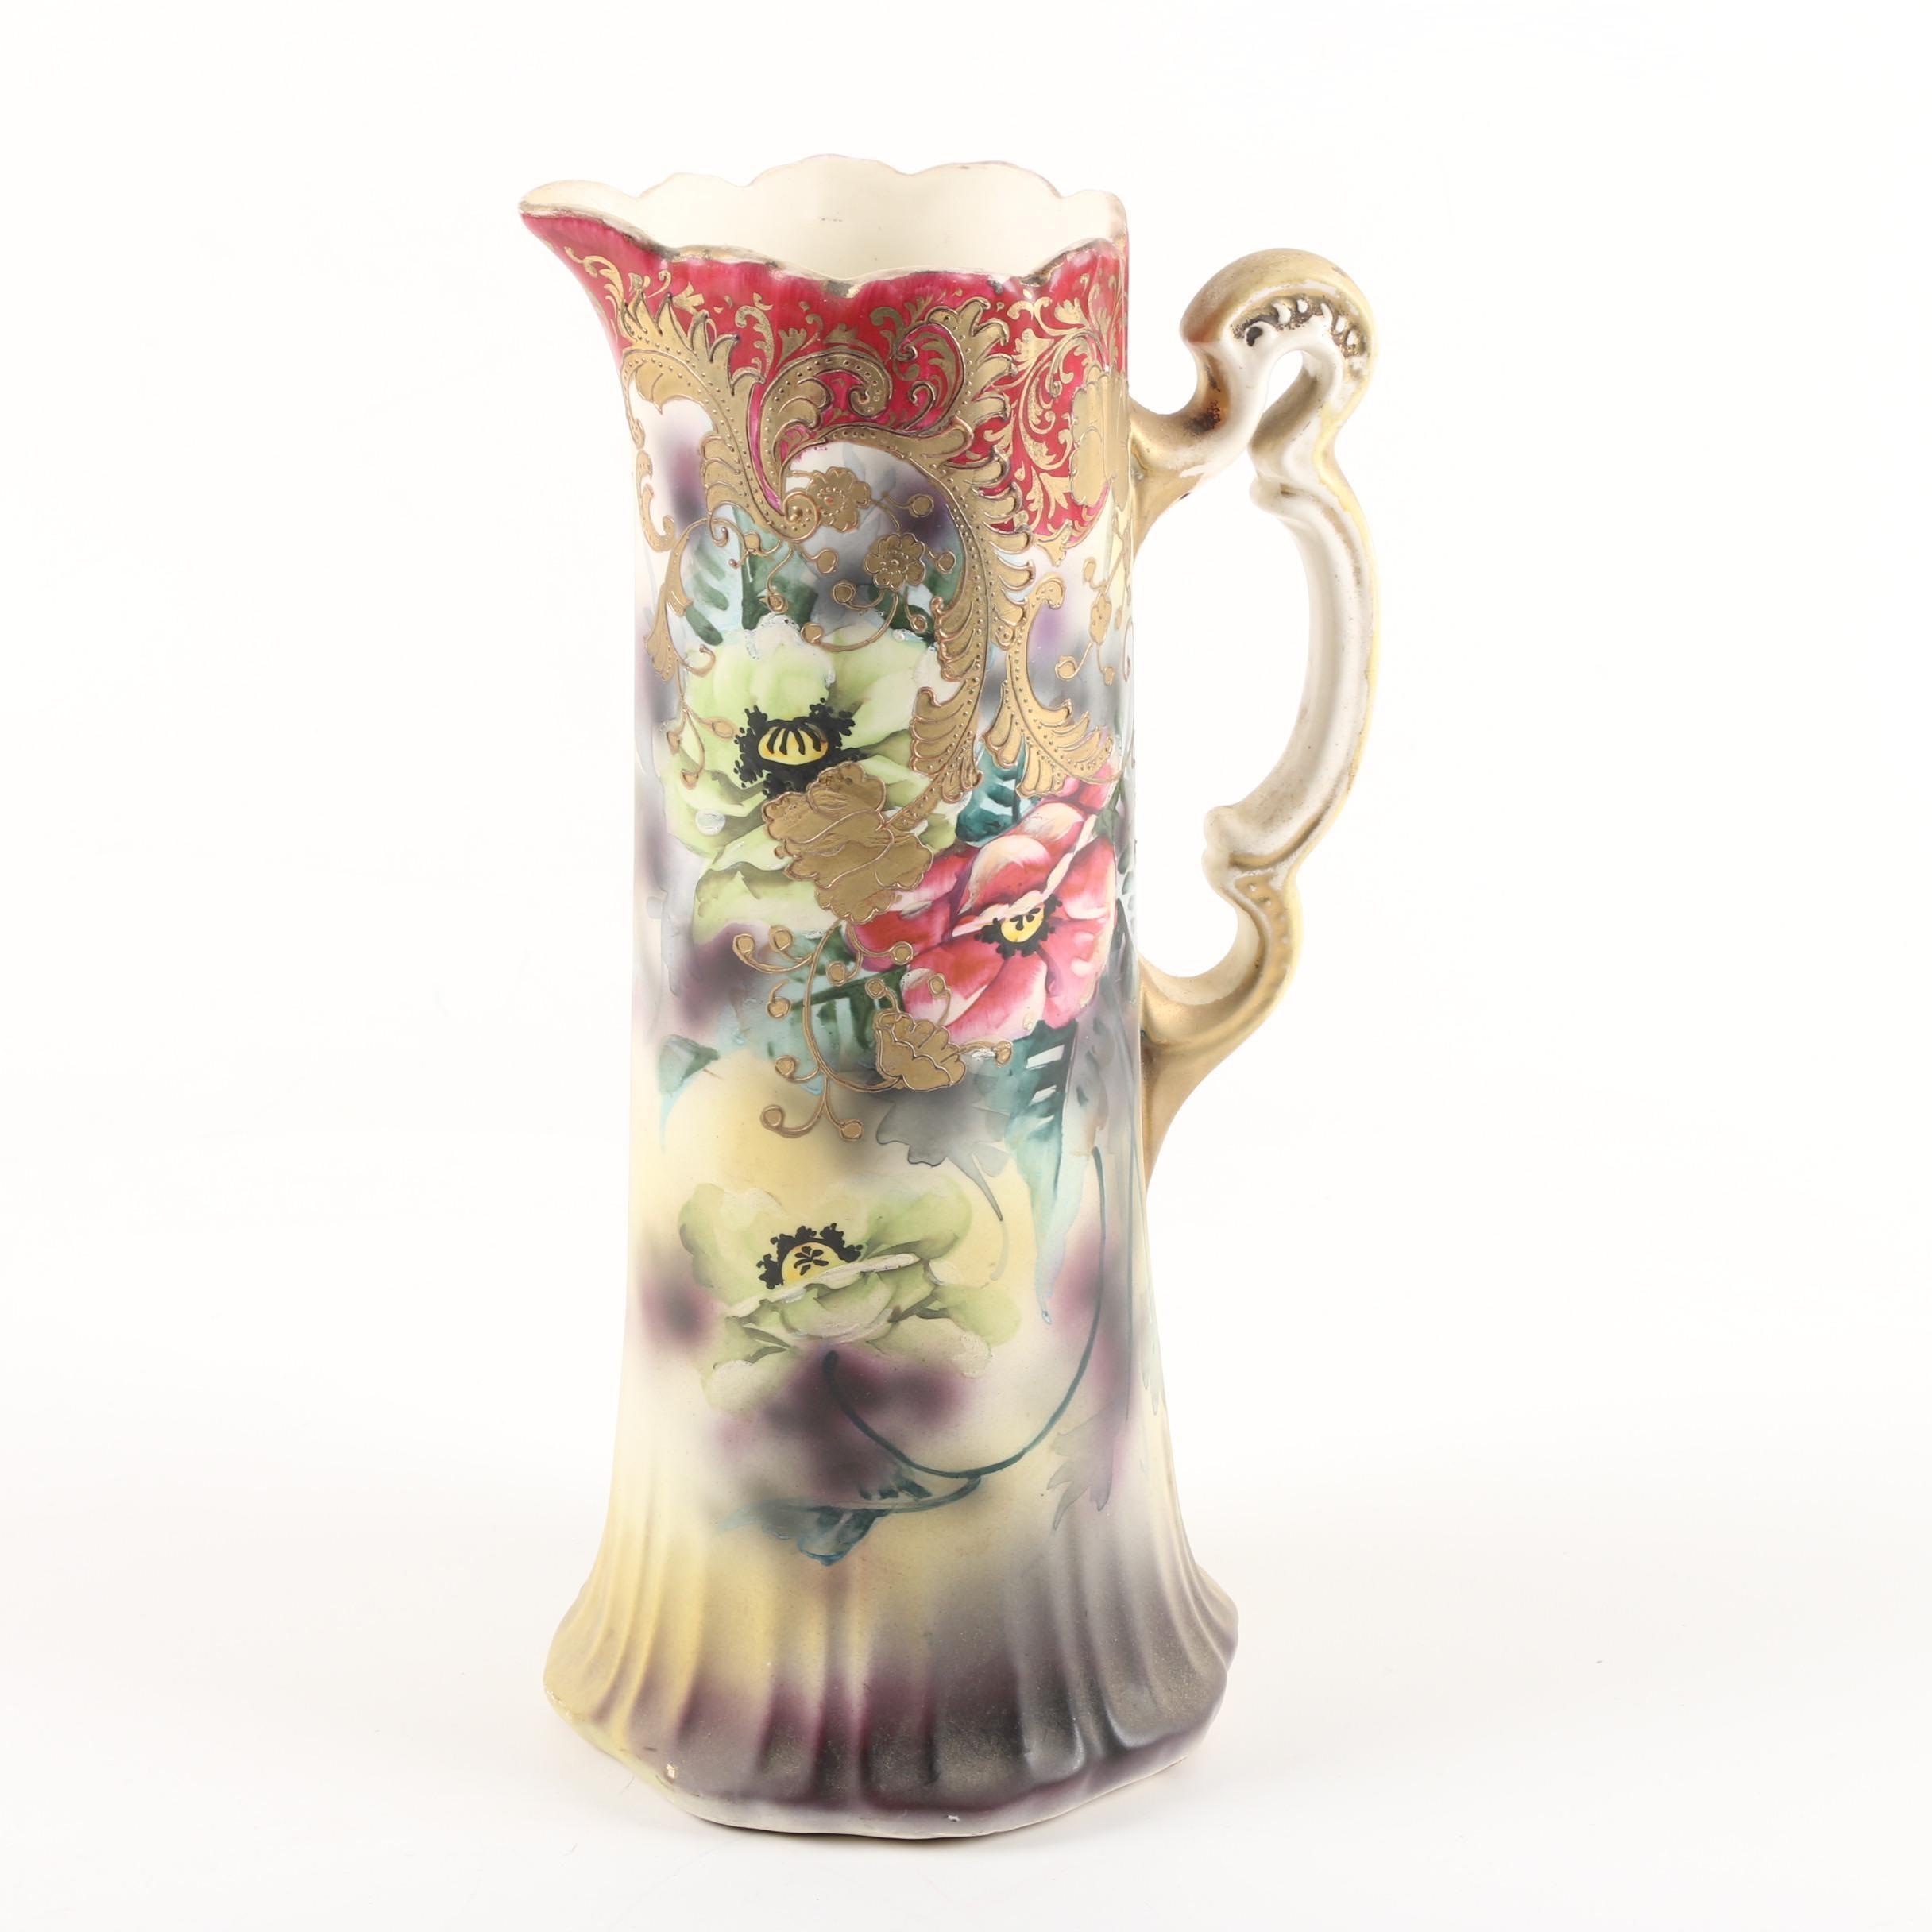 Vintage Royal Nishiki Nippon Hand-Painted Porcelain Pitcher